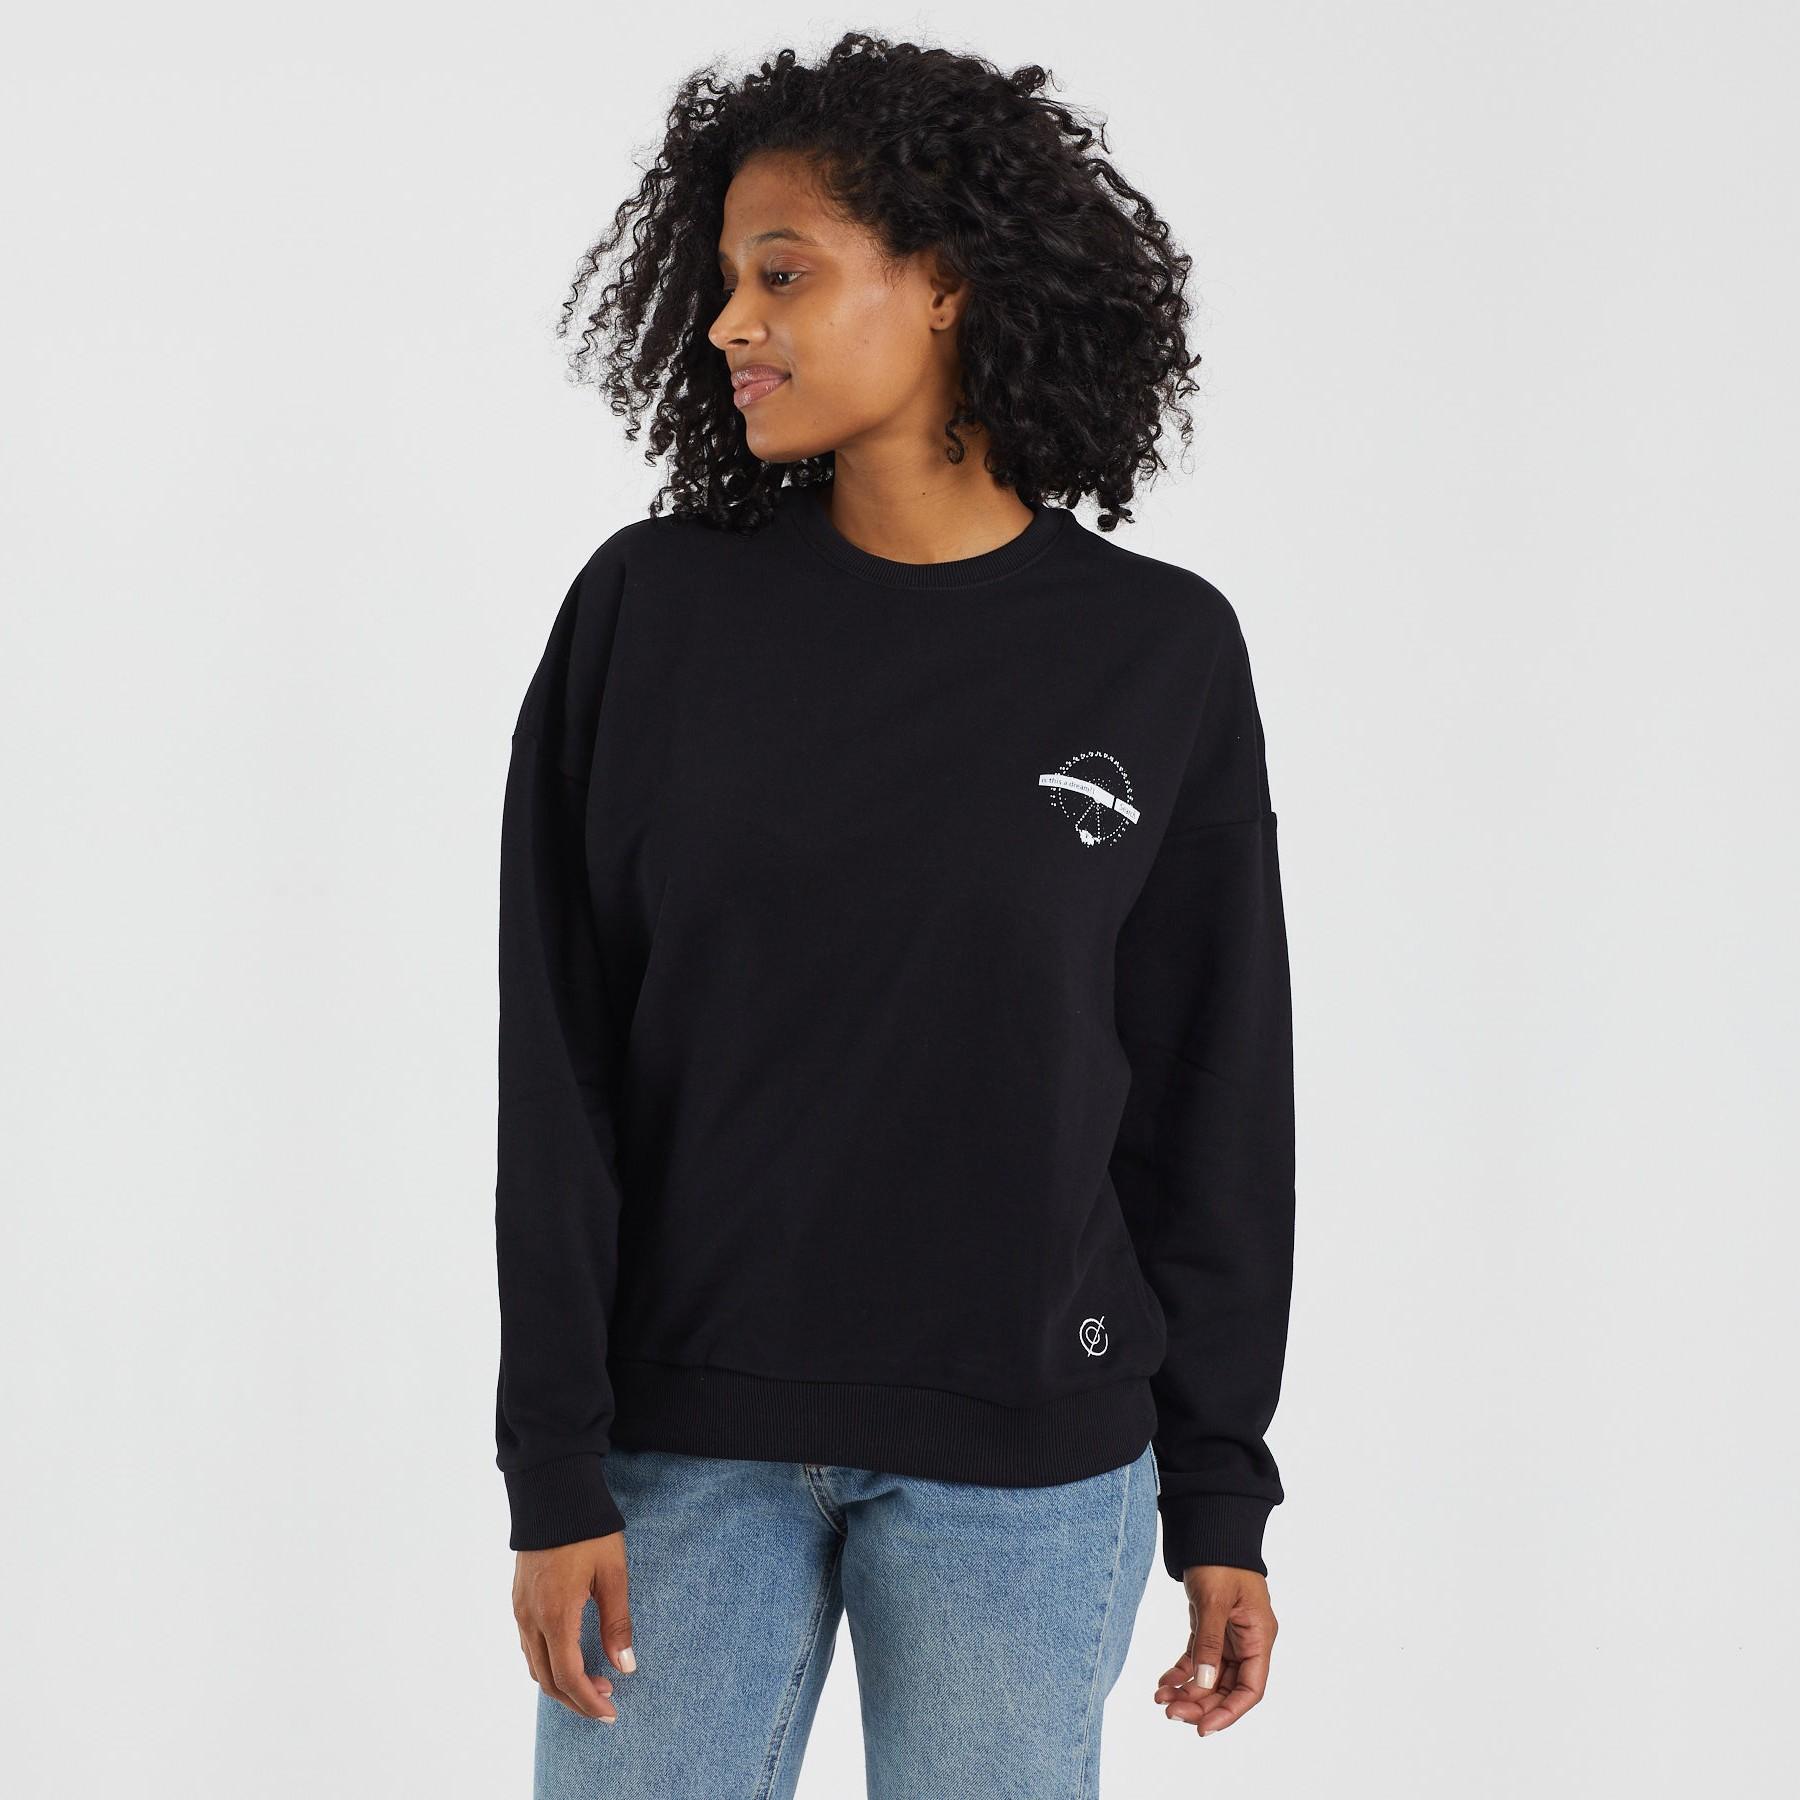 IS THIS A DREAM Unisex Sweatshirt